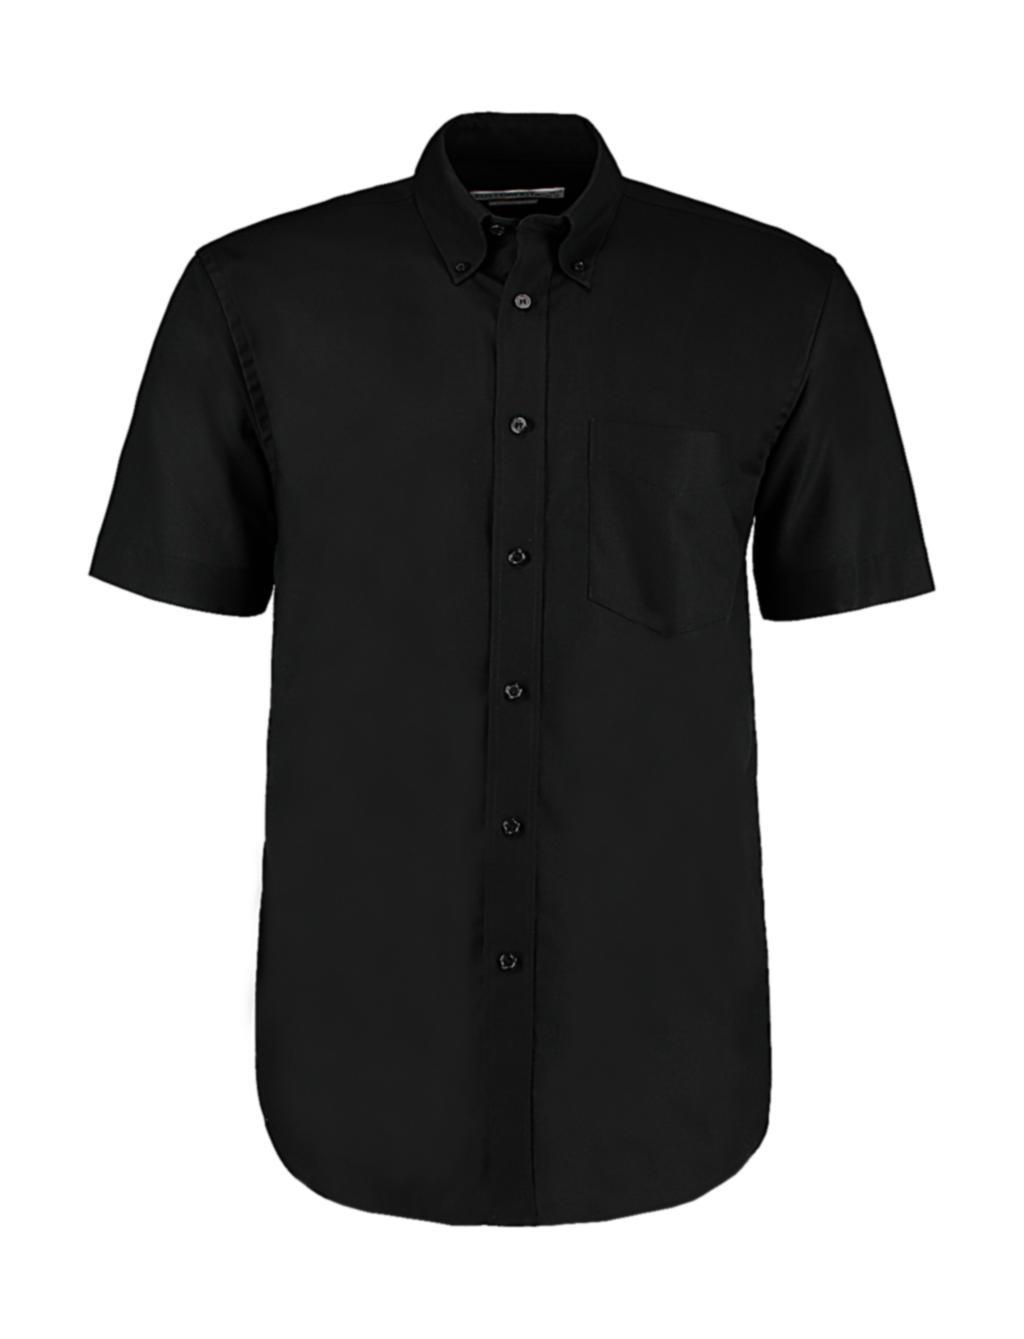 Košile Workwear Oxford Classic fit s kr. ruk. - zvìtšit obrázek